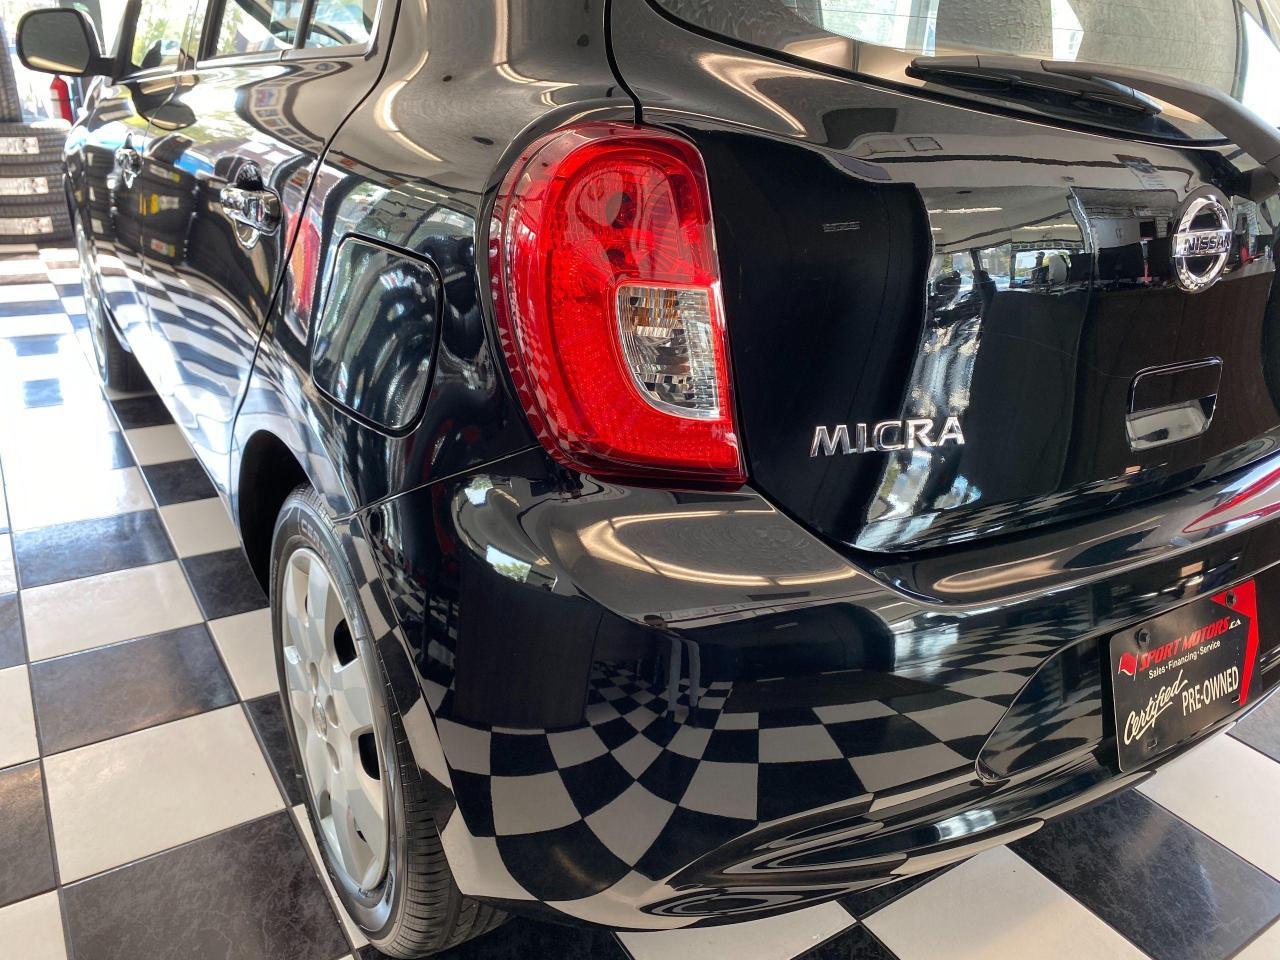 2016 Nissan Micra